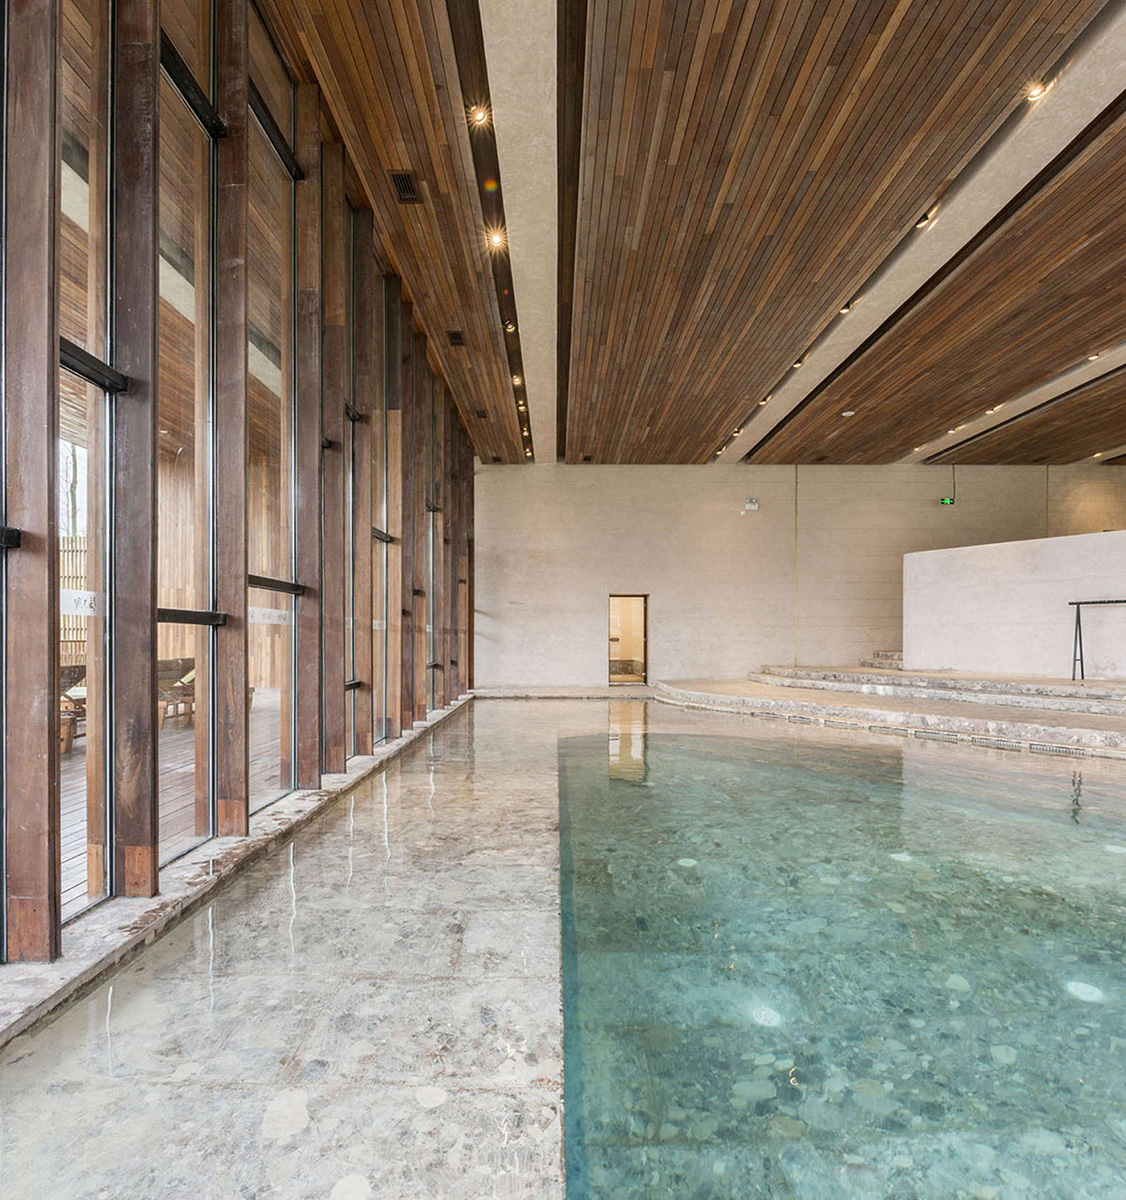 05-fushengyu-hot-spring-resort-aim-architecture-foto-dirk-weiblen